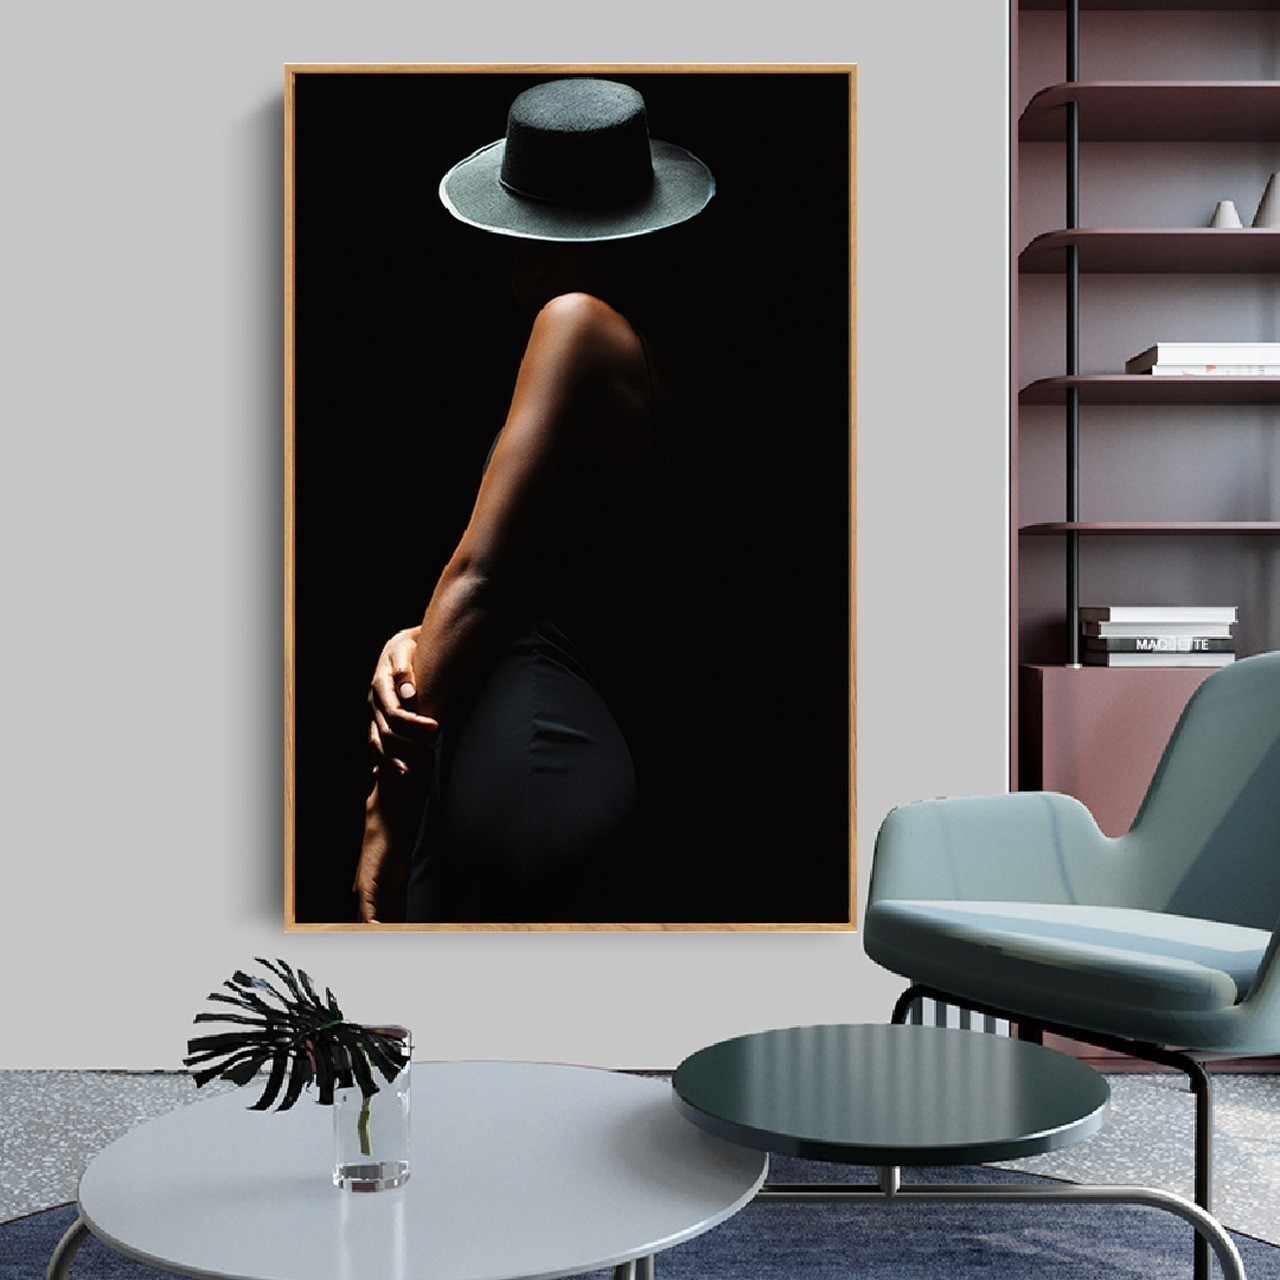 Quadro Decor A Mulher e o Chapéu preto